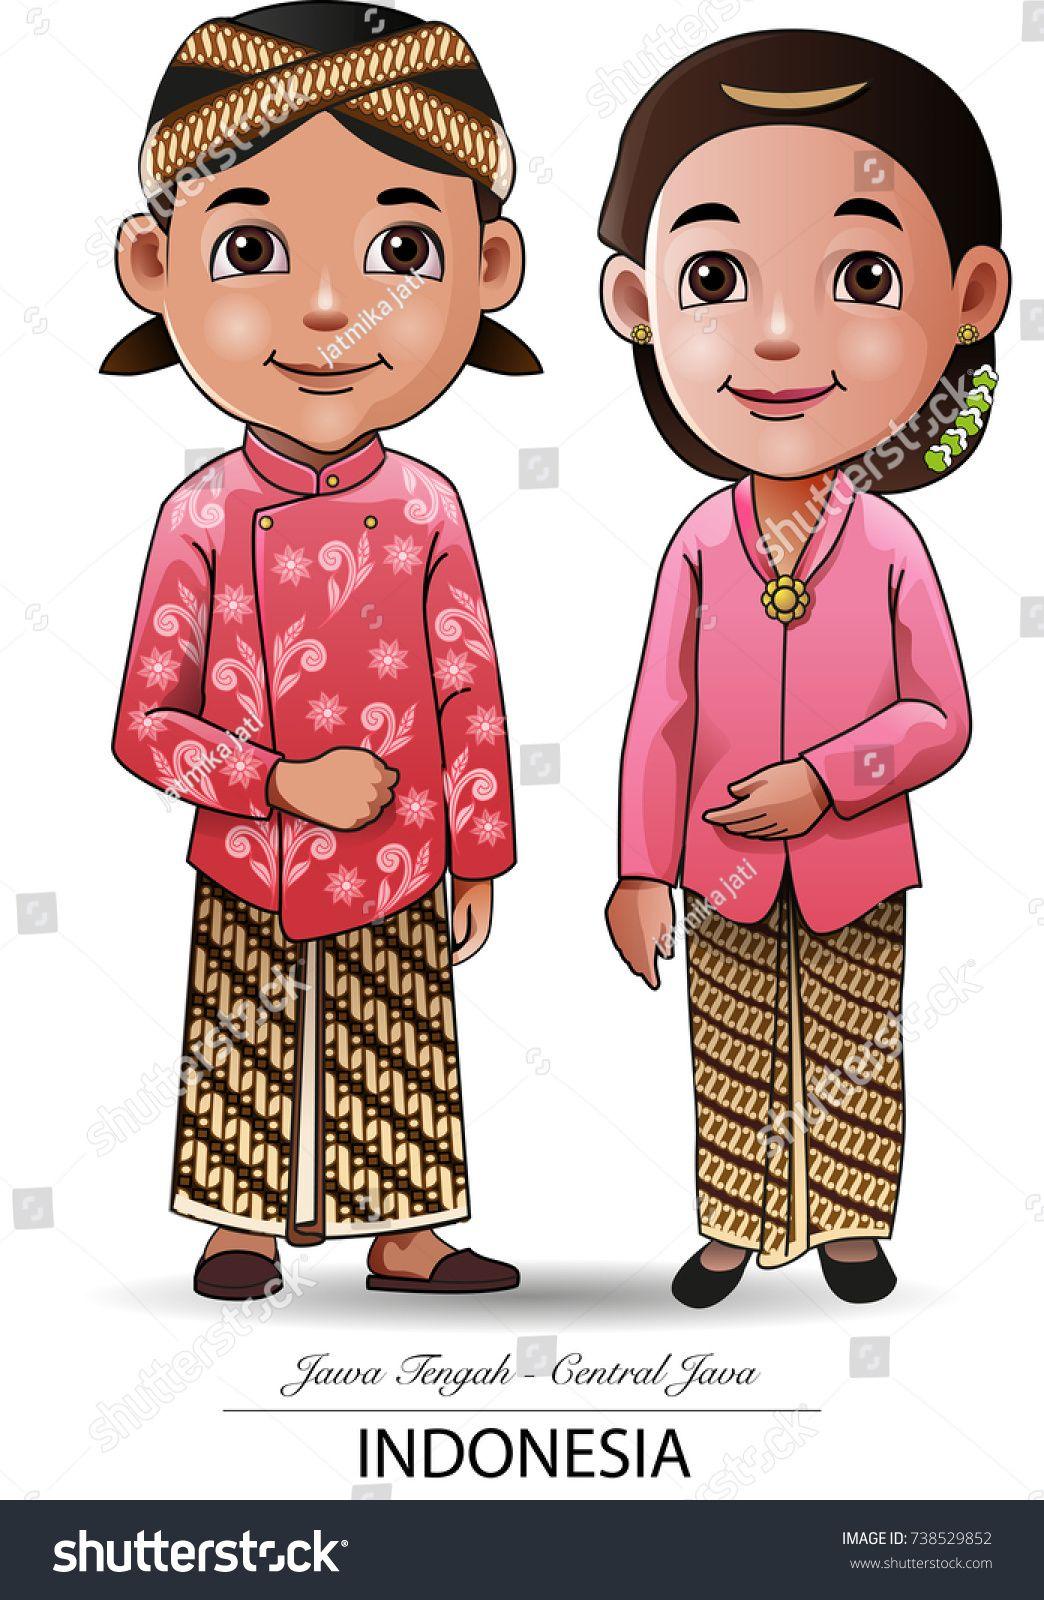 Download Gambar Pakaian Adat Jawa Tengah